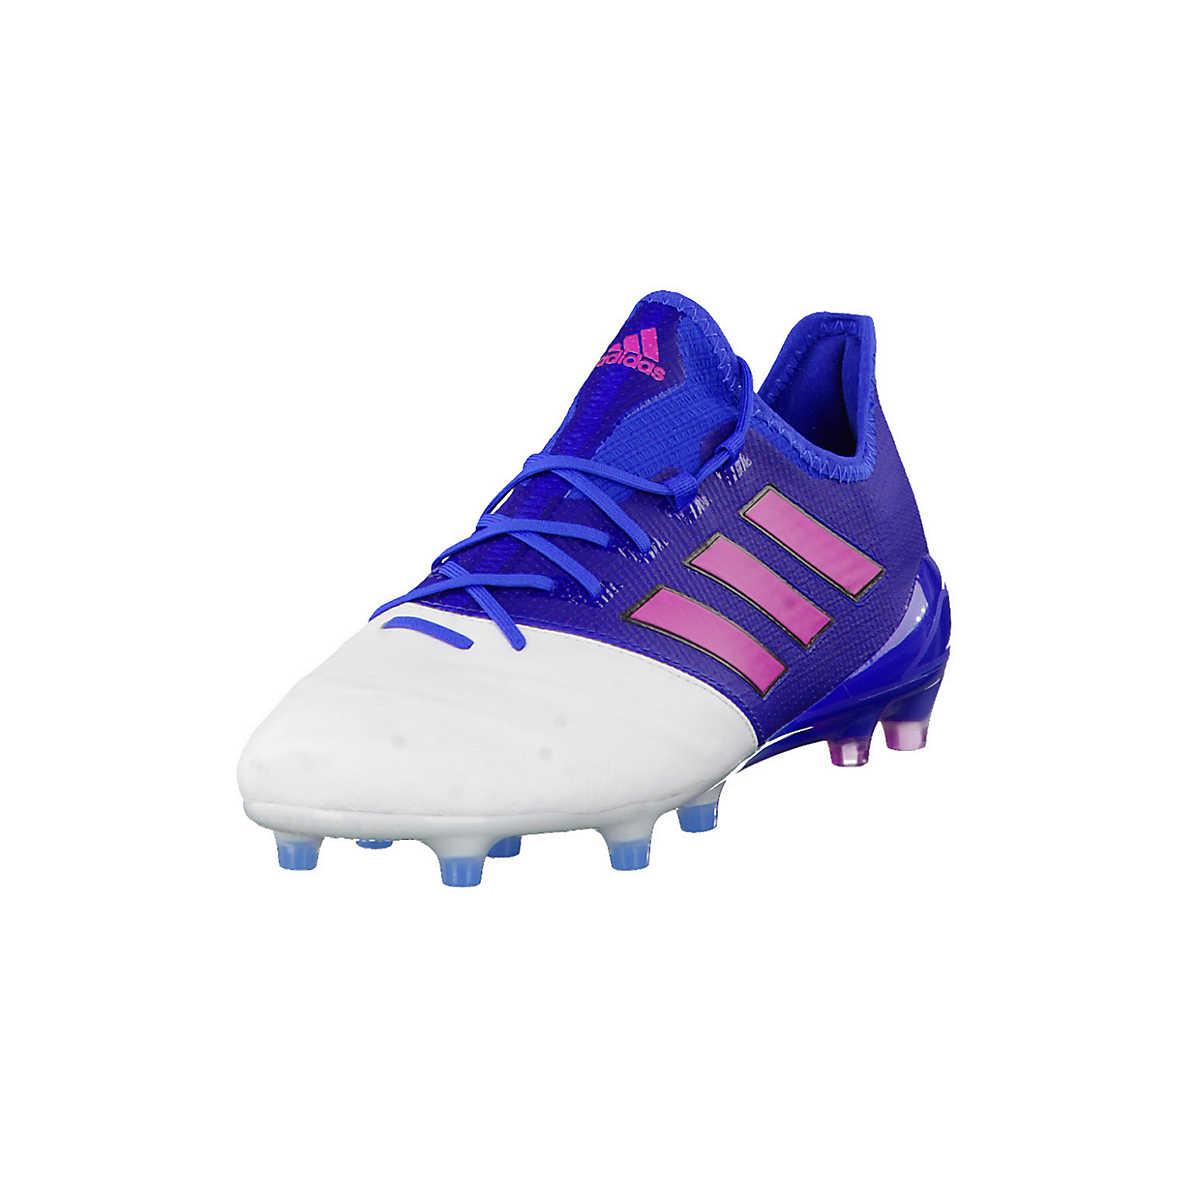 adidas Performance Sportschuhe blau-kombi - adidas Performance - Sportschuhe - Schuhe - mirapodo.de